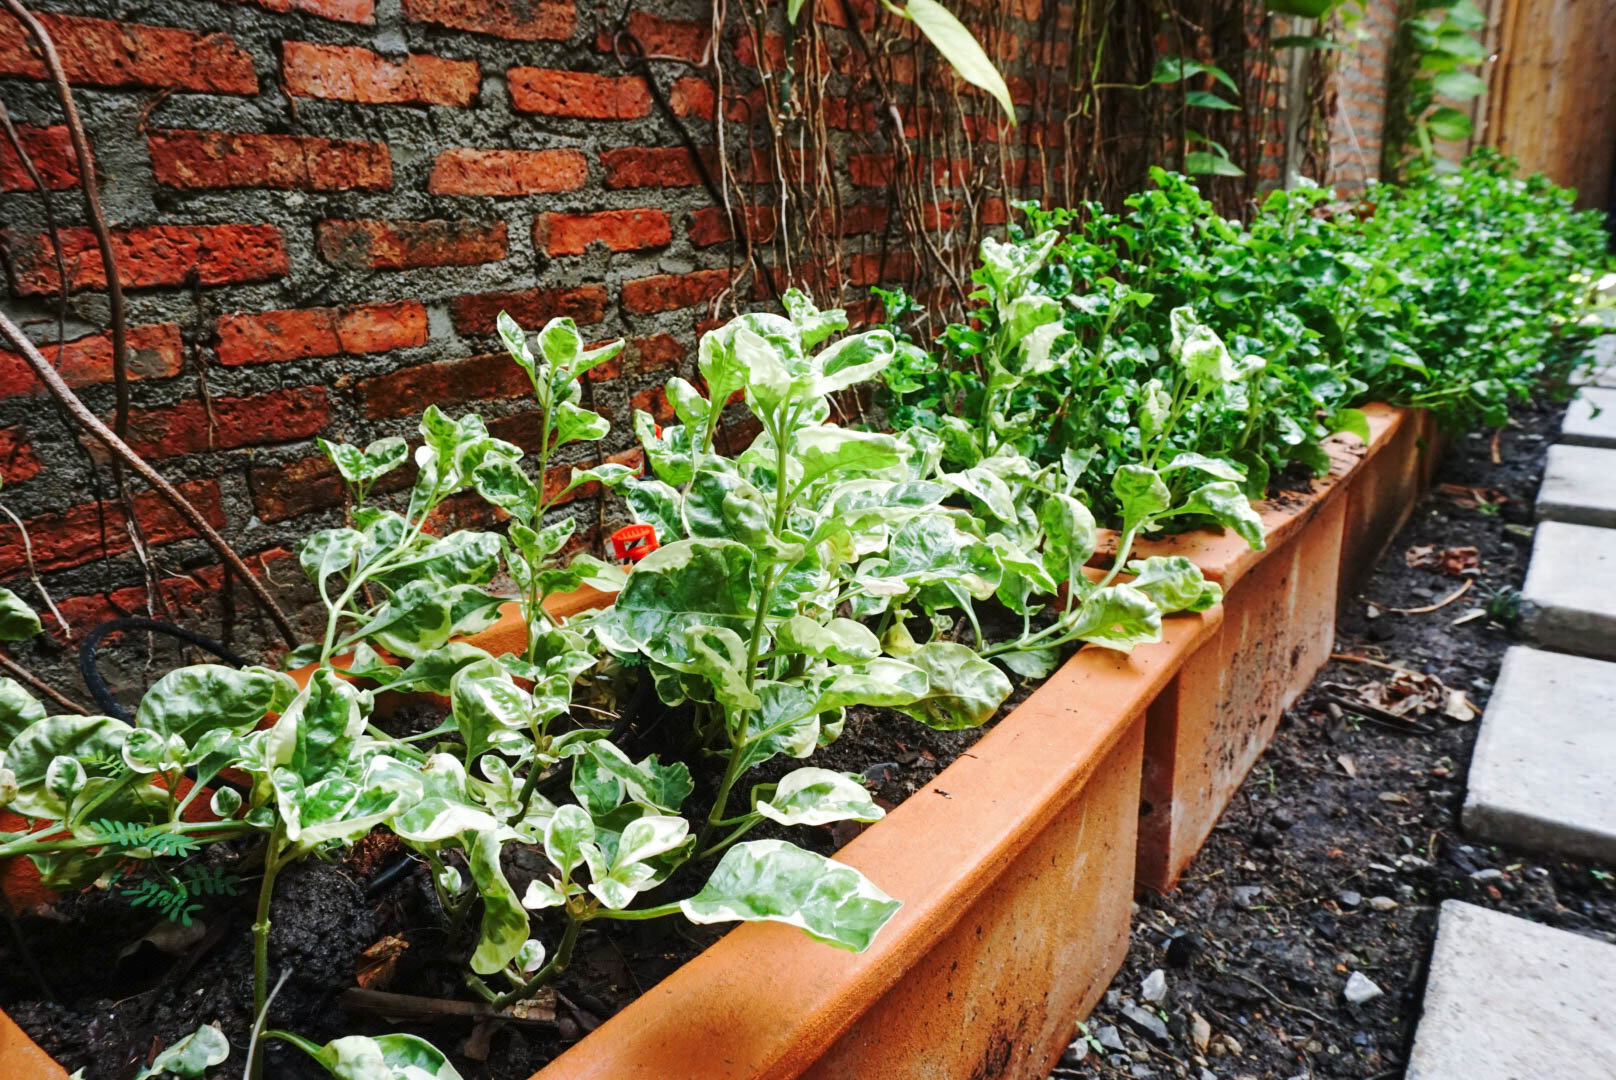 Bo.lan Edible Garden: Four types of watercress in ZONE D - The Semi-sheltered Garden